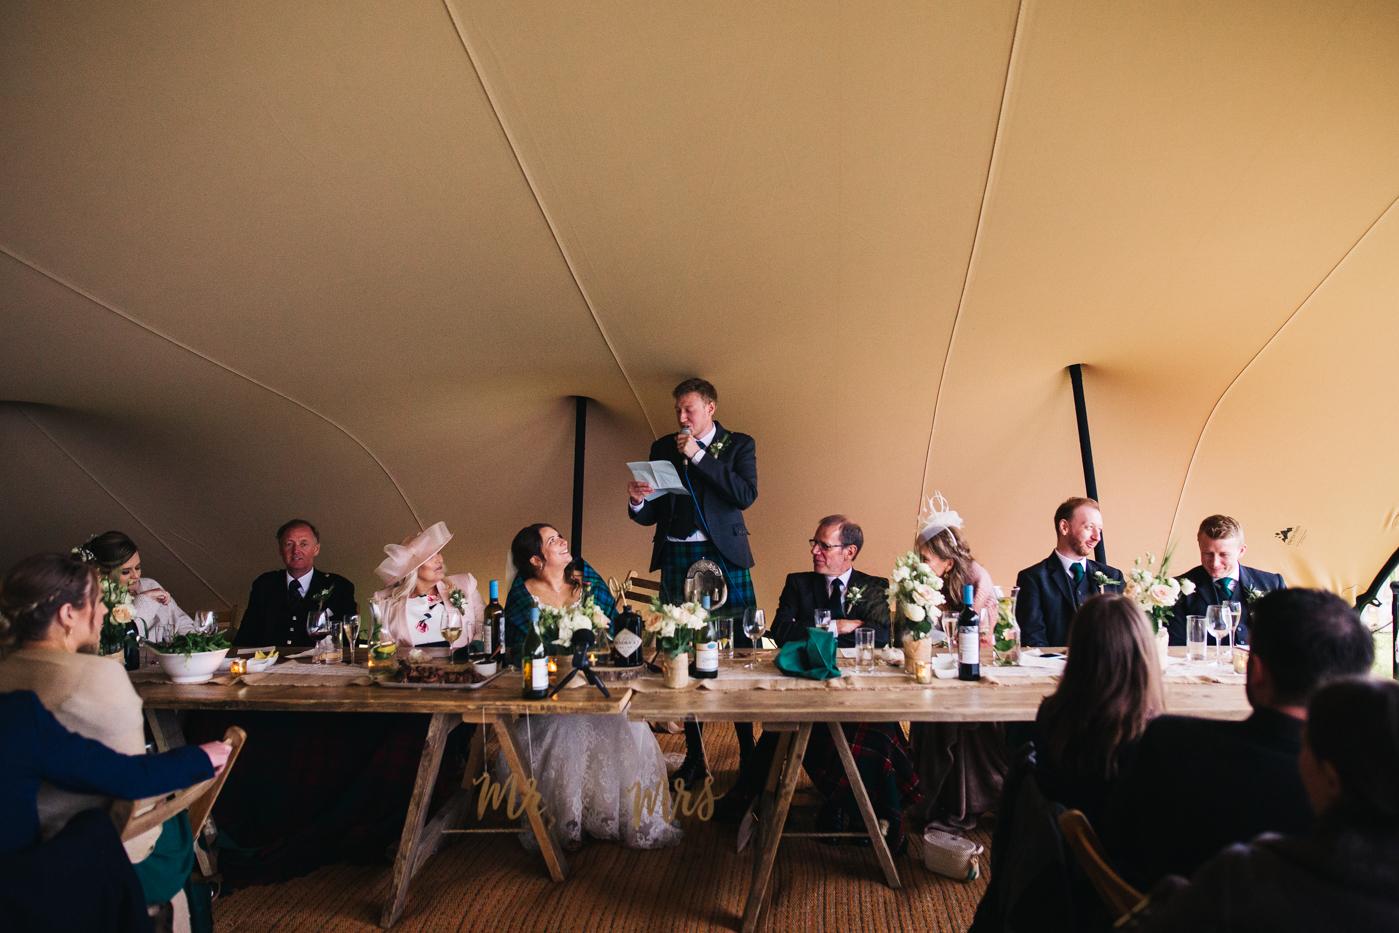 scottish-wedding-trossachs-loch-tay-highlannds-relaxed-photography-photographer-0044.jpg